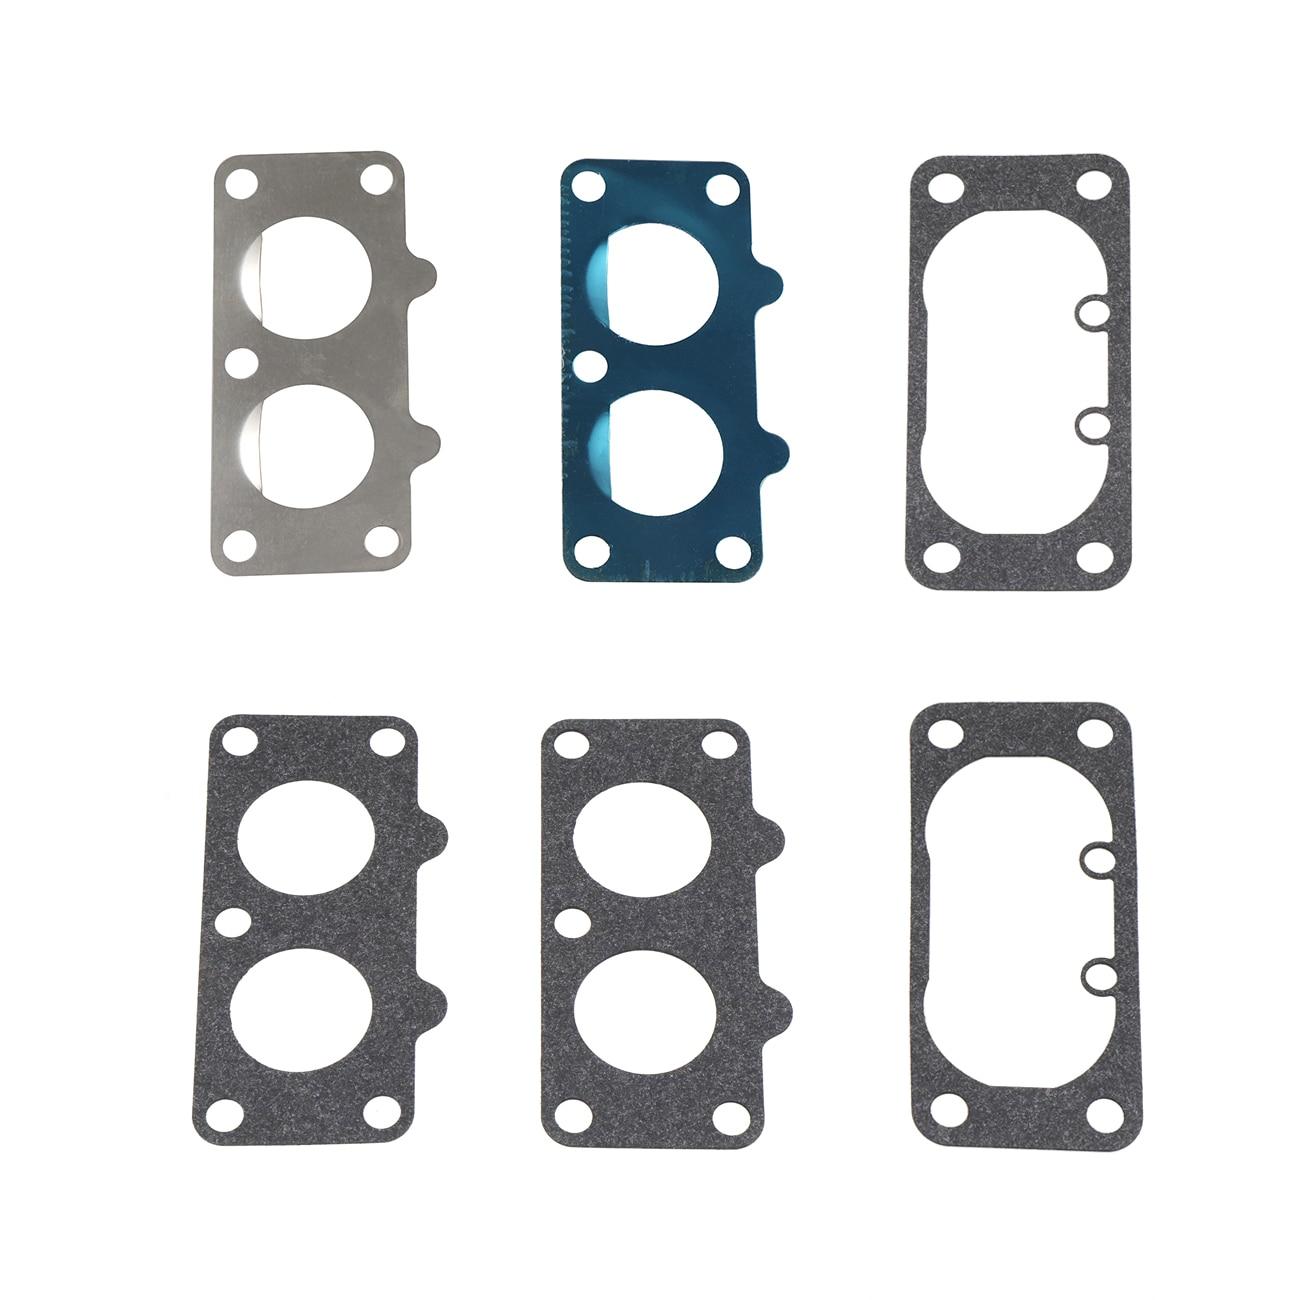 Carburateur Nettoyage Brosse Pour BS 20-25hp 699709 499804 791230 799230 - 3